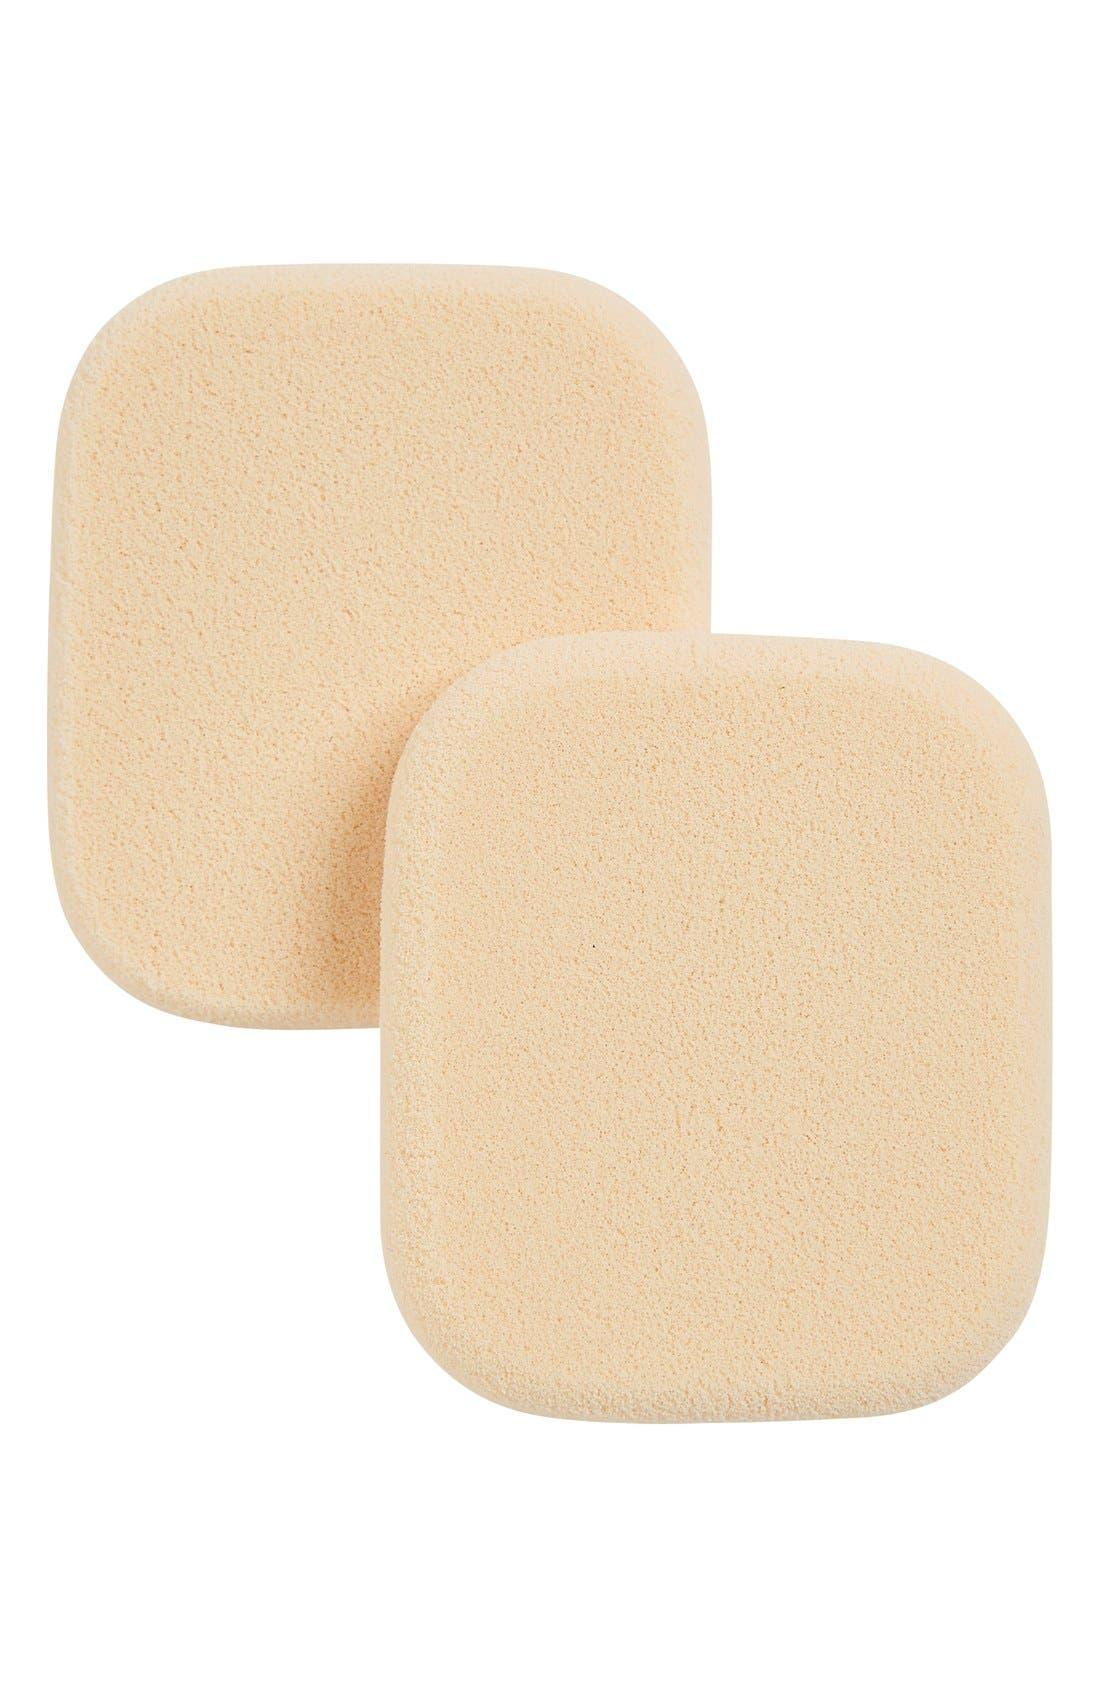 Radiant Powder Foundation Sponge,                         Main,                         color, NO COLOR